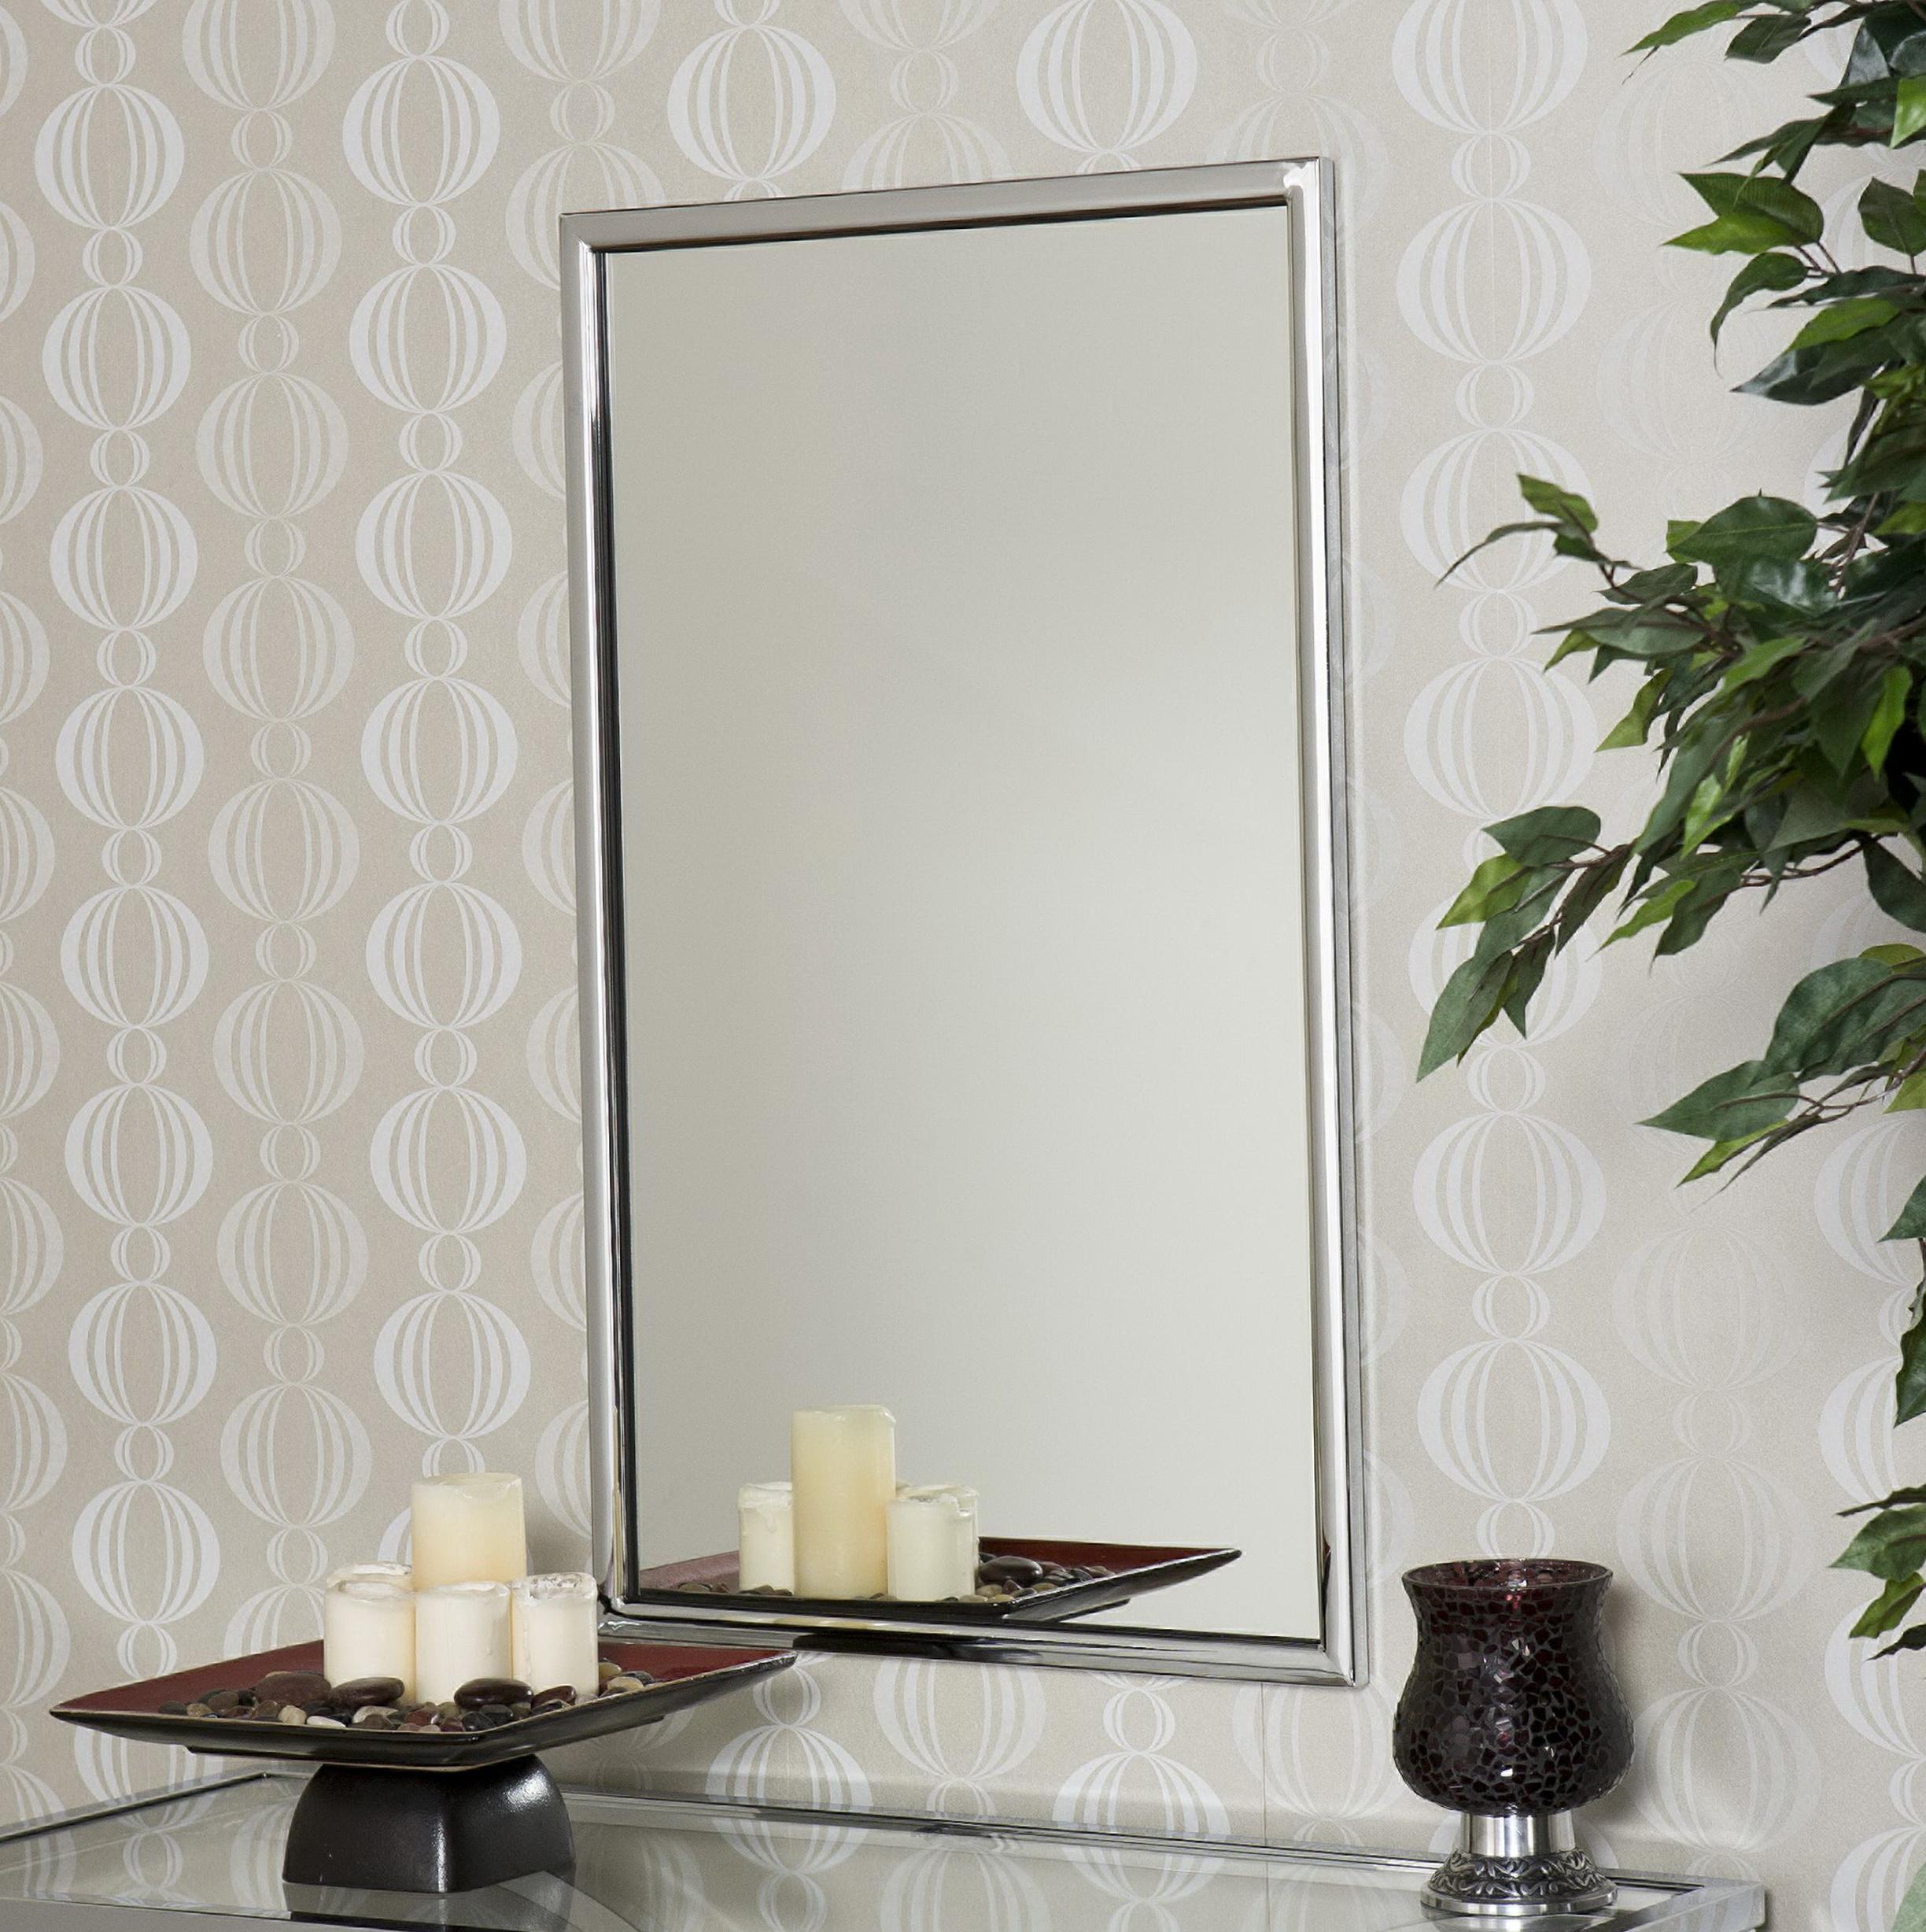 Mirror Picture Frames Amazon